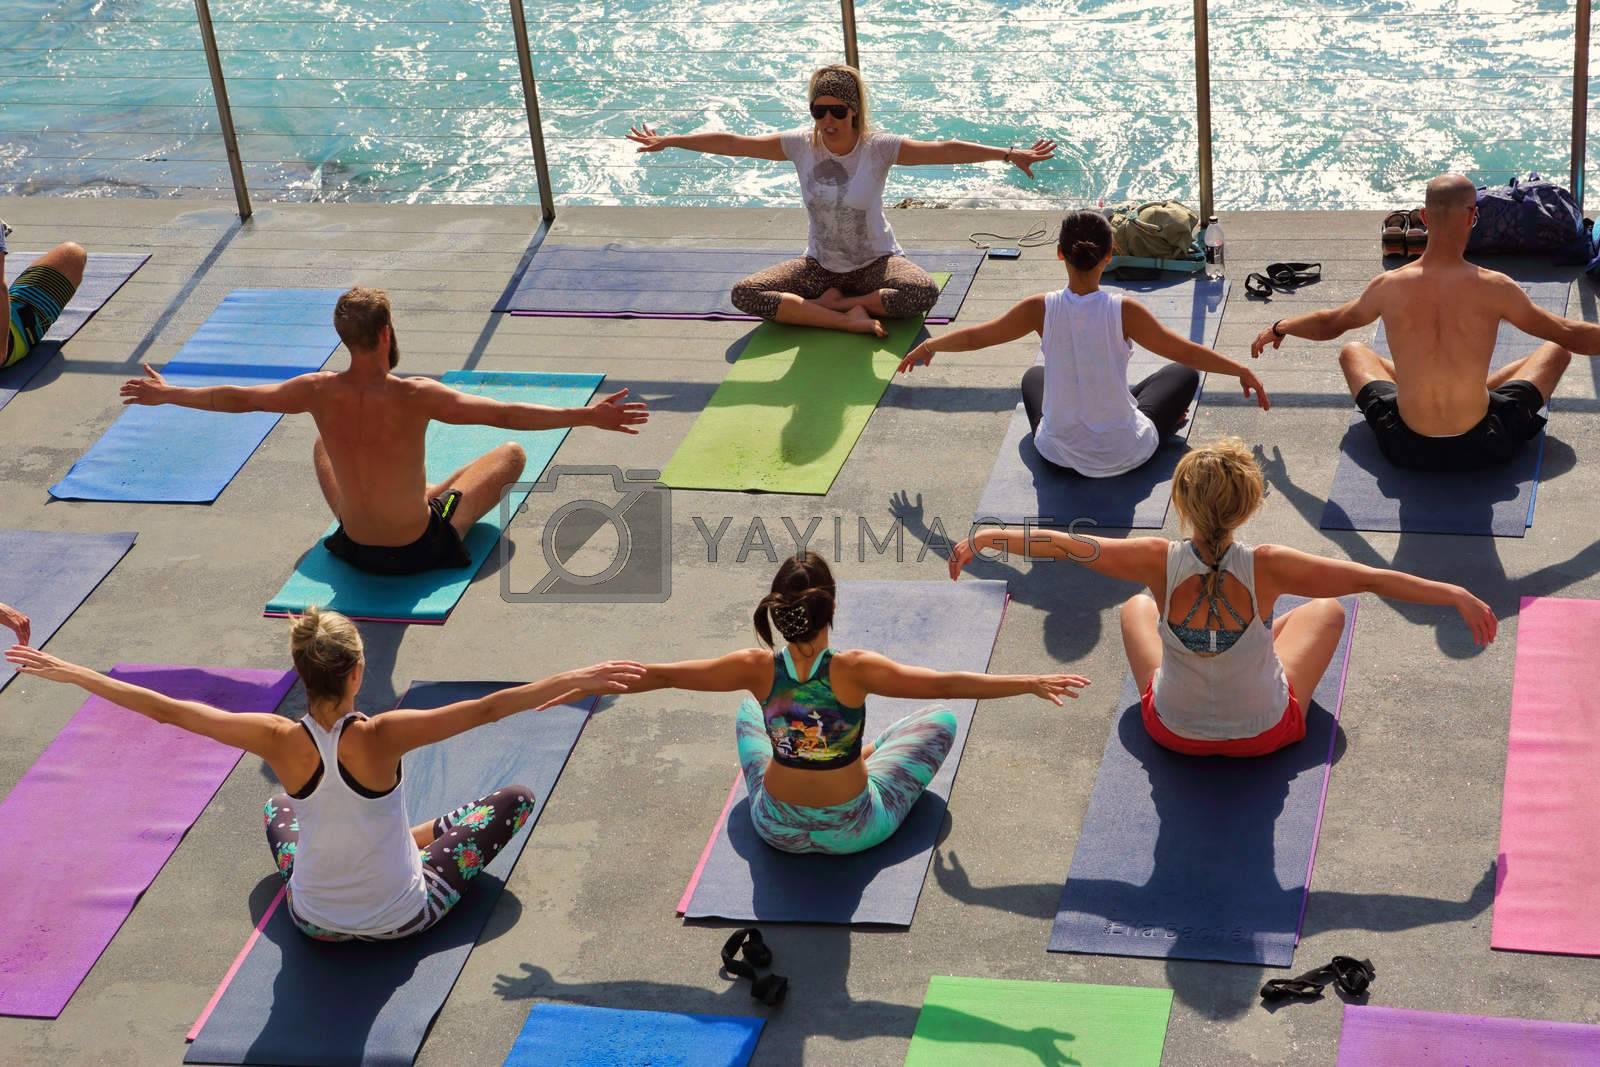 BONDI, AUSTRALIA- OCTOBER 25, 2015;  Yoga by the beach Bondi.   Yoga class beside the pool at Bondi Icebergs, Bondi Australia.  Participants perform yoga moves outdoors by the sea.